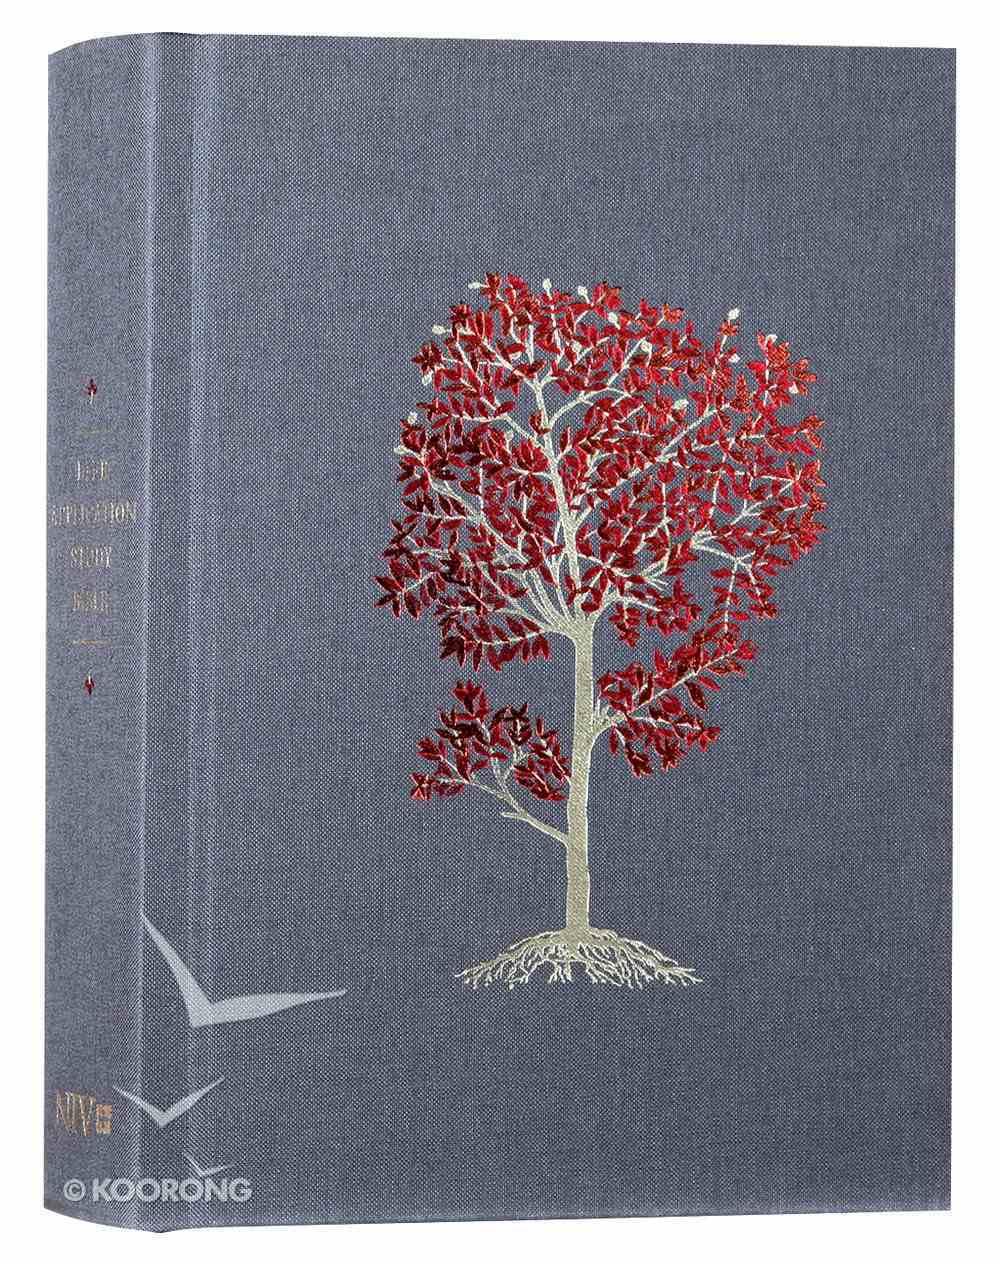 NIV Life Application Study Bible Deluxe Linen Flourishing Arbor (Red Letter Edition) Hardback